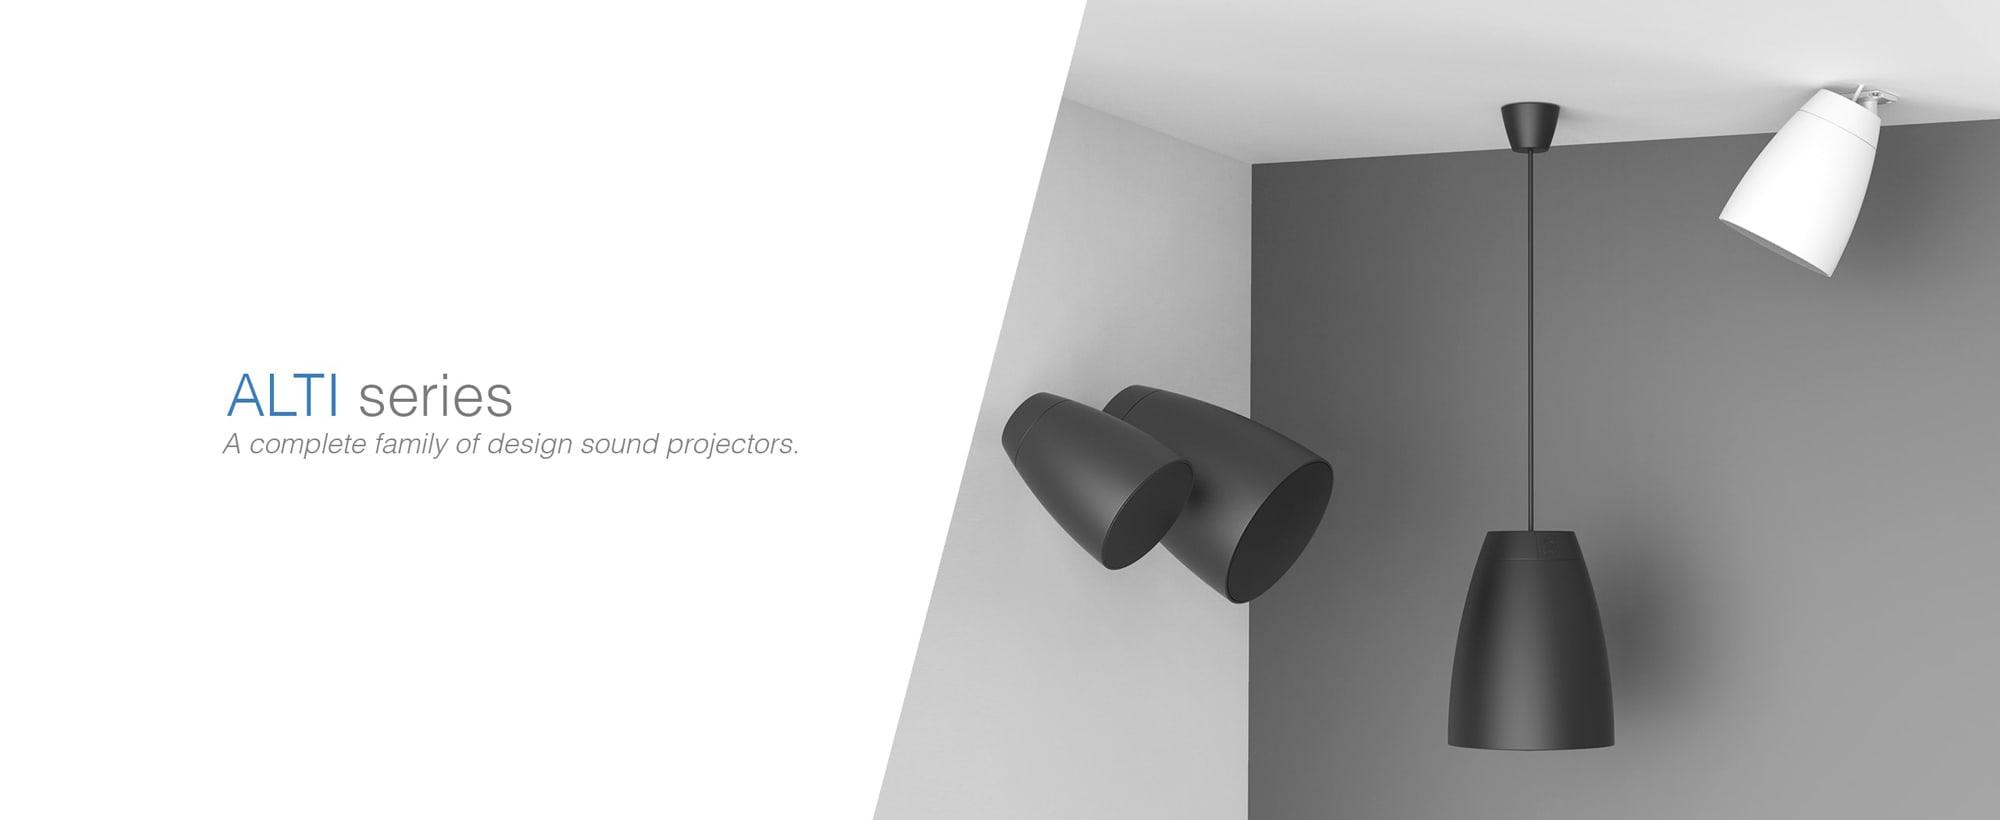 Audac Introduces New Design Speaker Series 'ALTI' | XLR